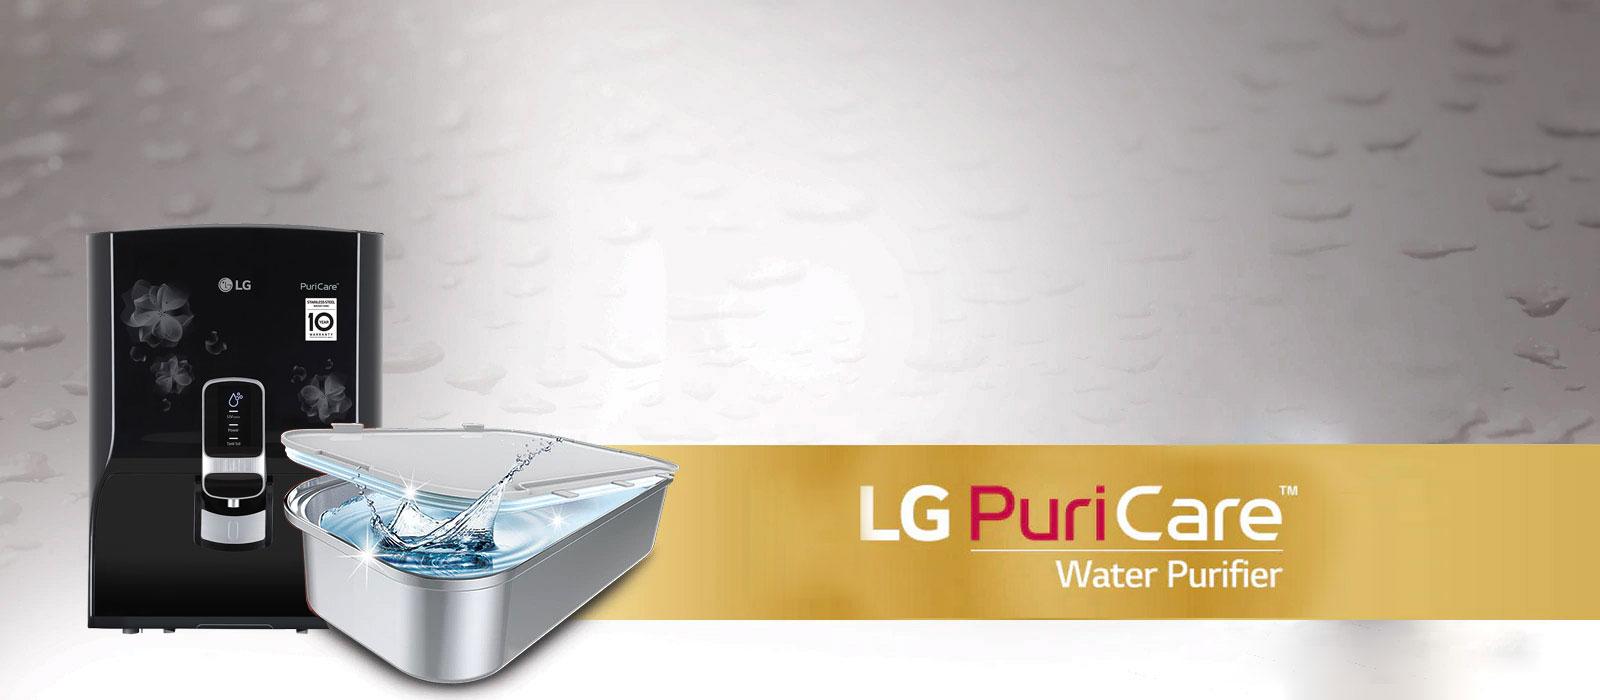 LG WW151NP Award Certification